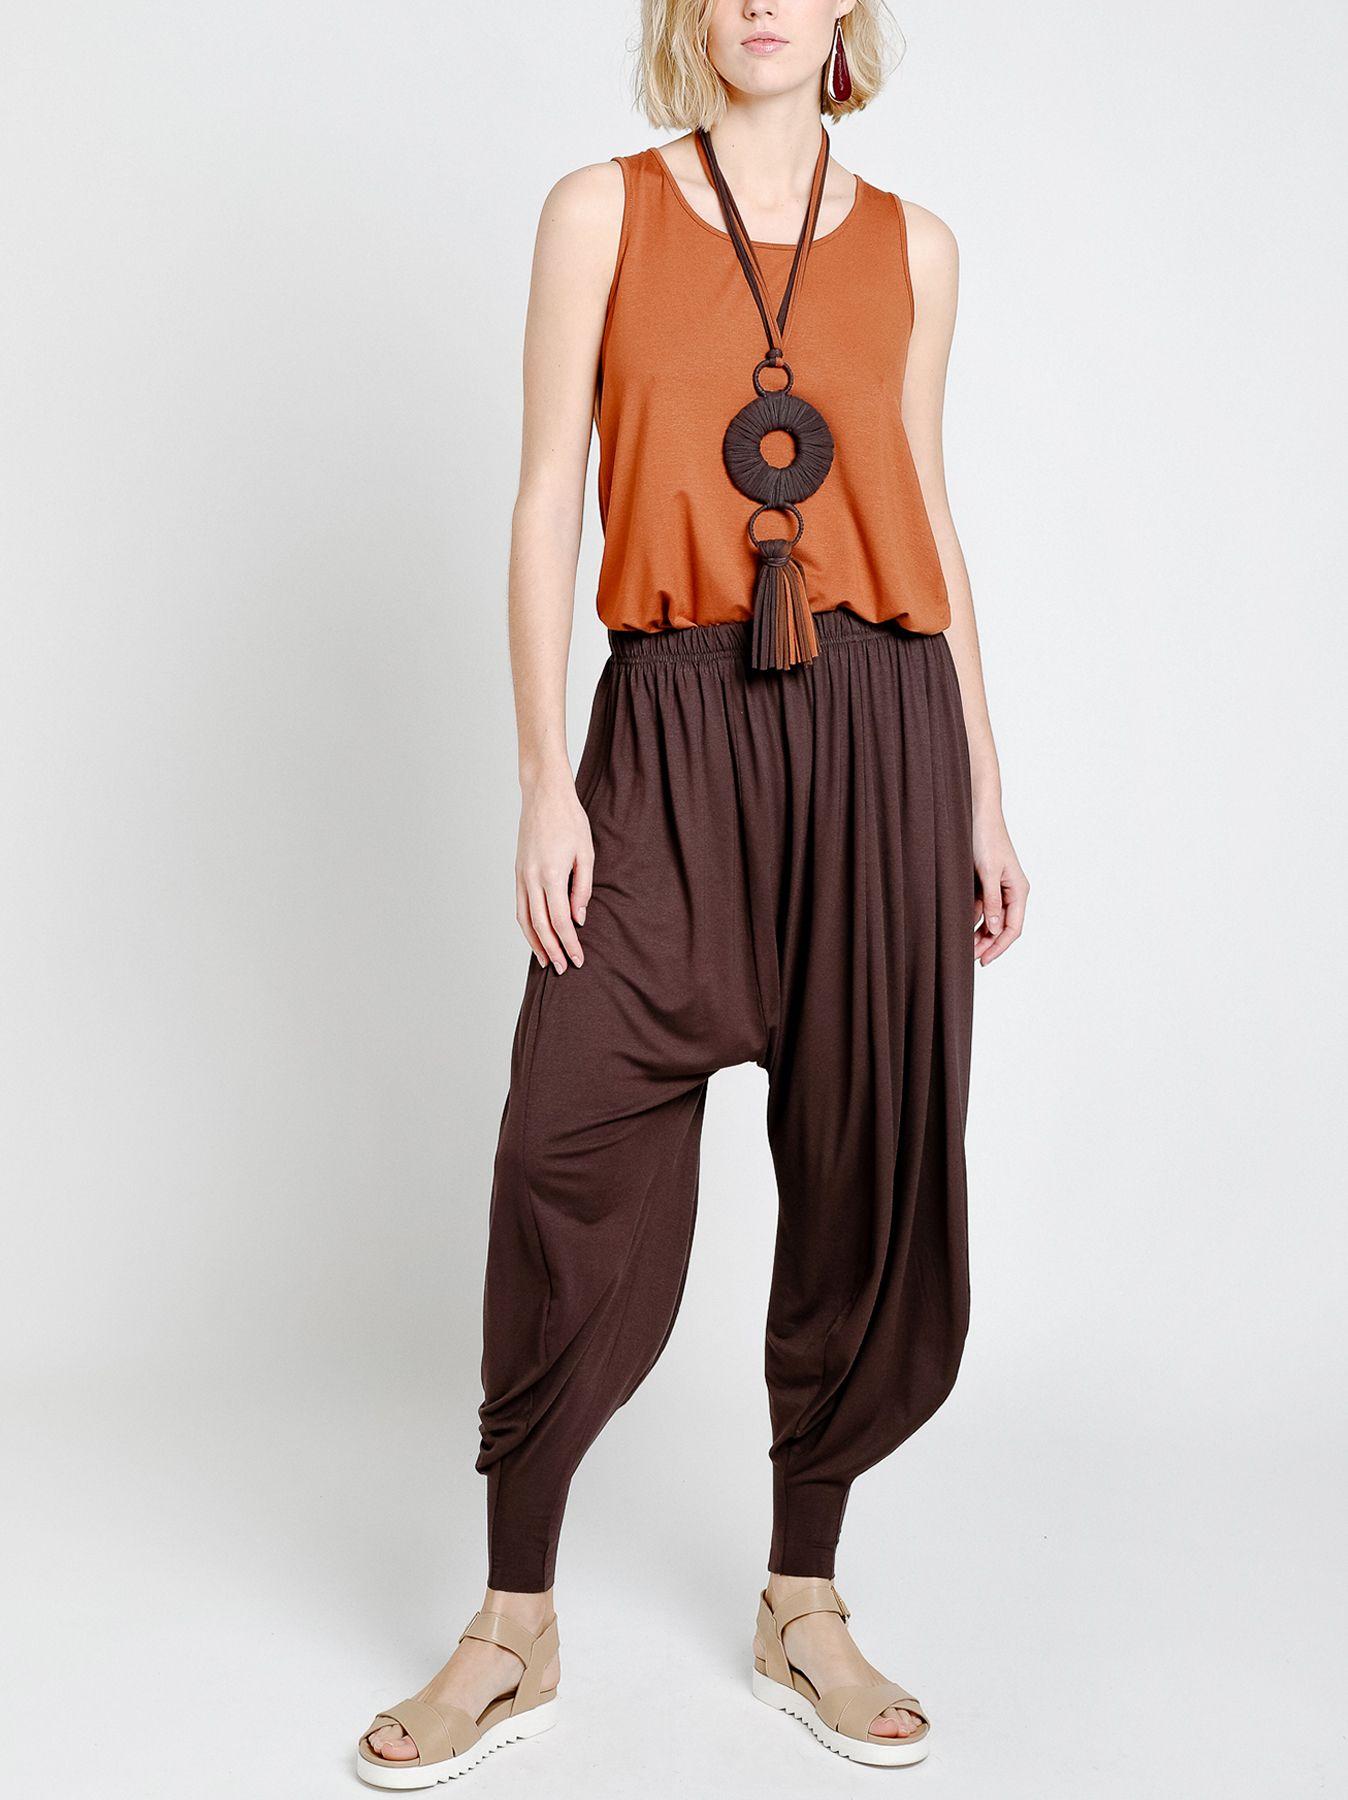 Pantalone arabo